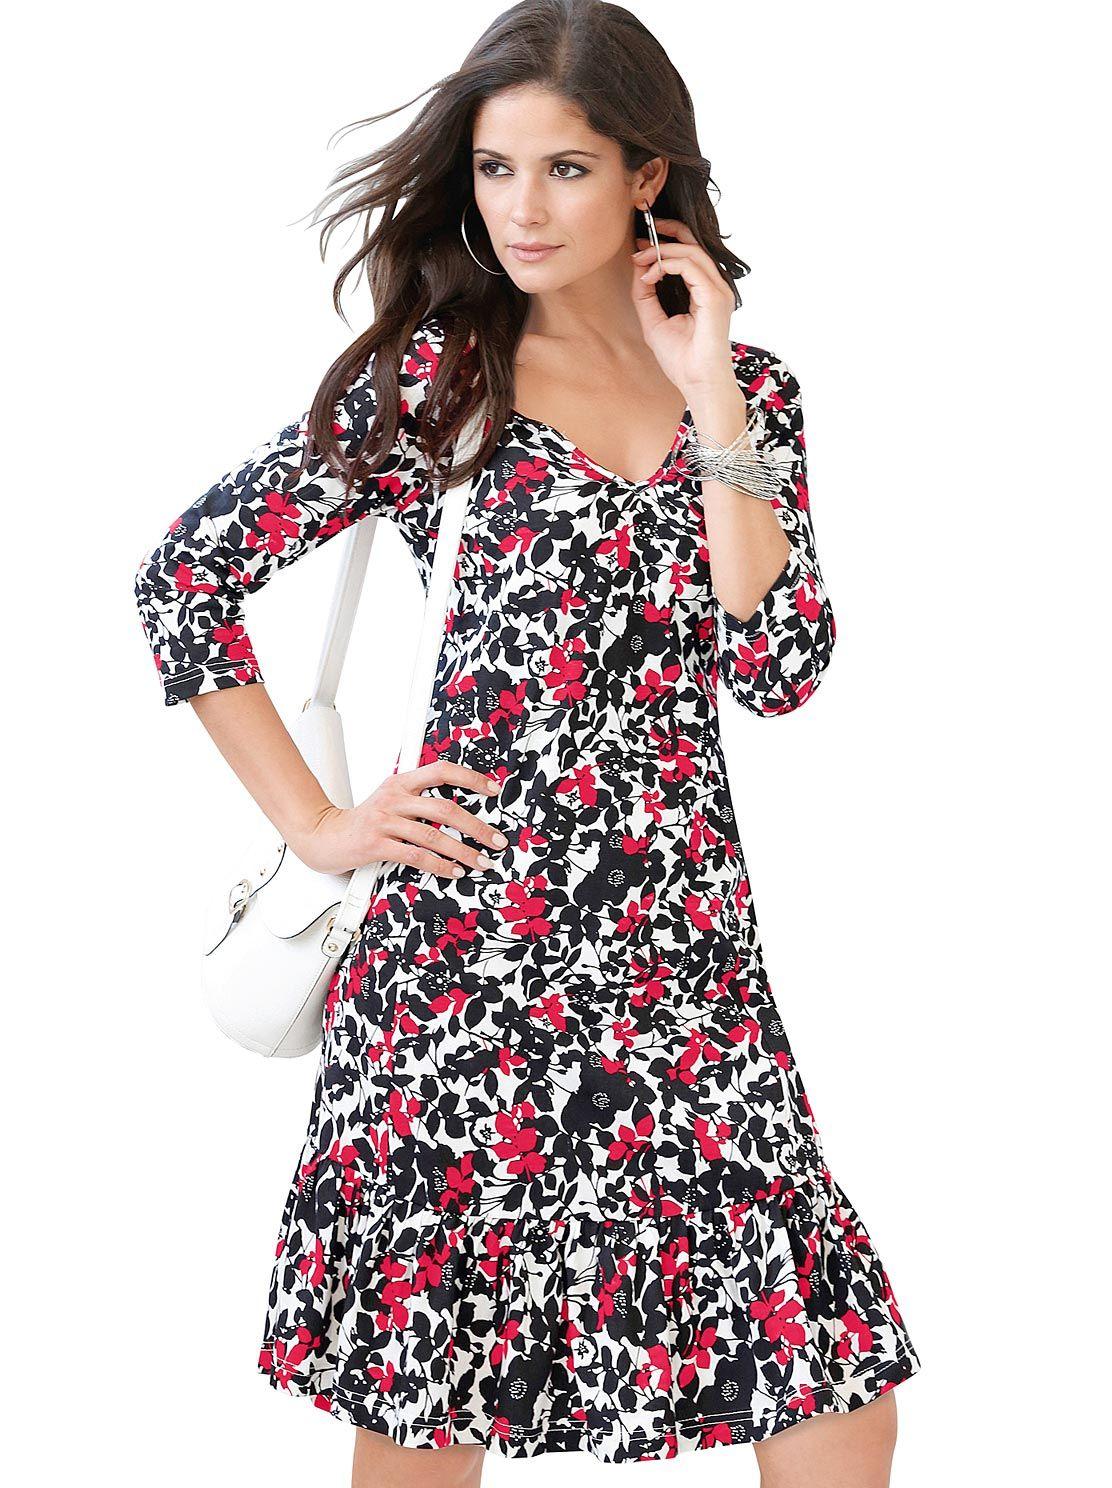 0c4020d1a23091 Jersey-Kleid in kirsche-schwarz-bedruckt 29